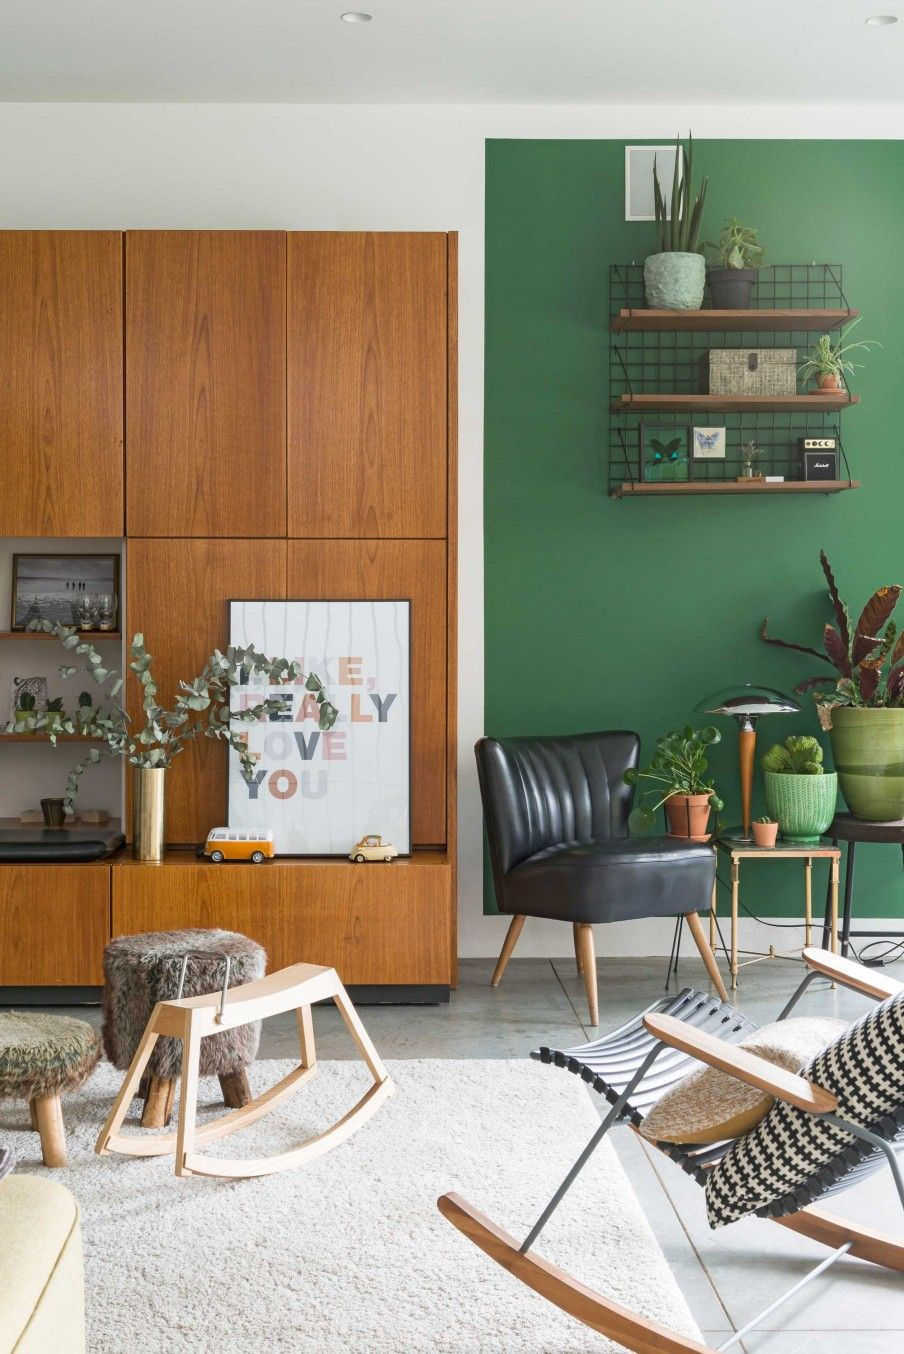 Woonkamer   living room   vtwonen 07-2017   Styling & Fotografie ...